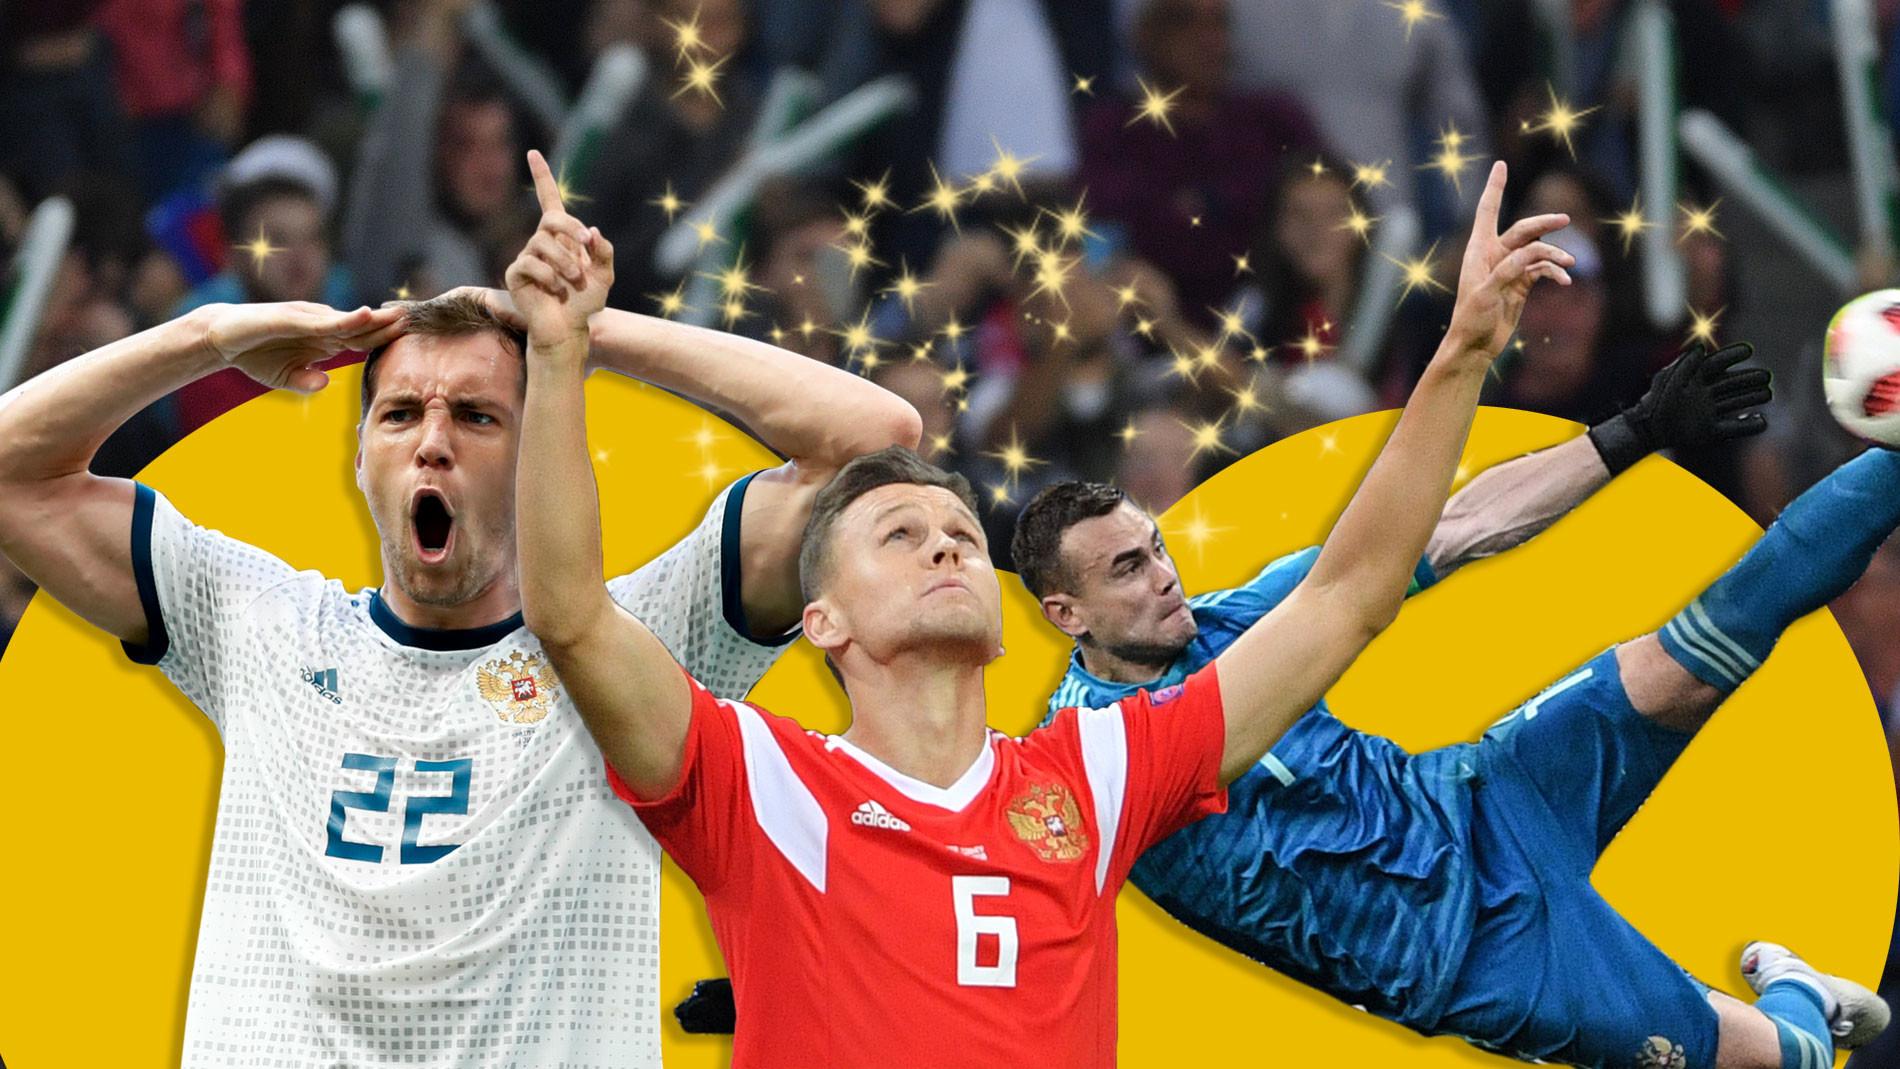 <p>Фото: &copy; РИА Новости/Алексей Филиппов &copy; AP</p>